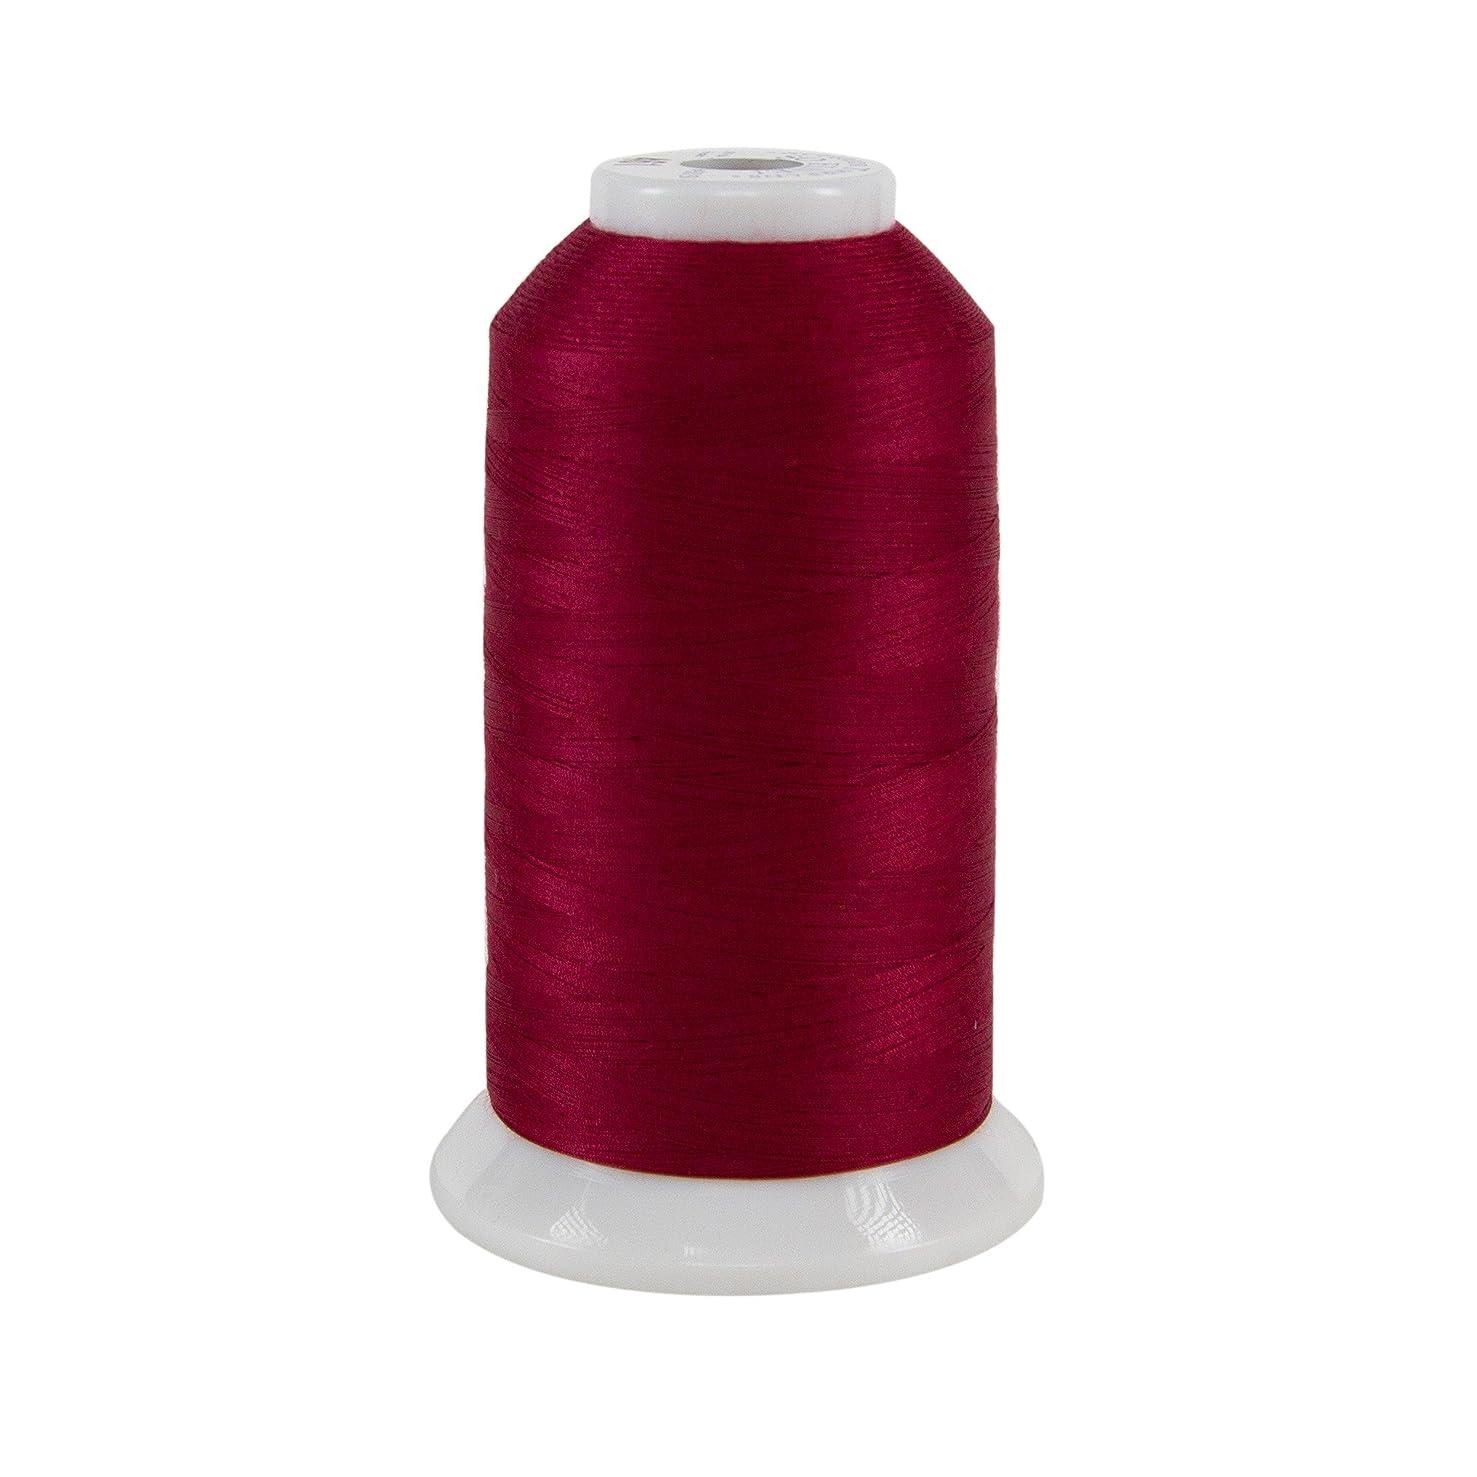 Superior Threads 11602-461 So Fine Campfire 3-Ply 50W Polyester Thread, 3280 yd